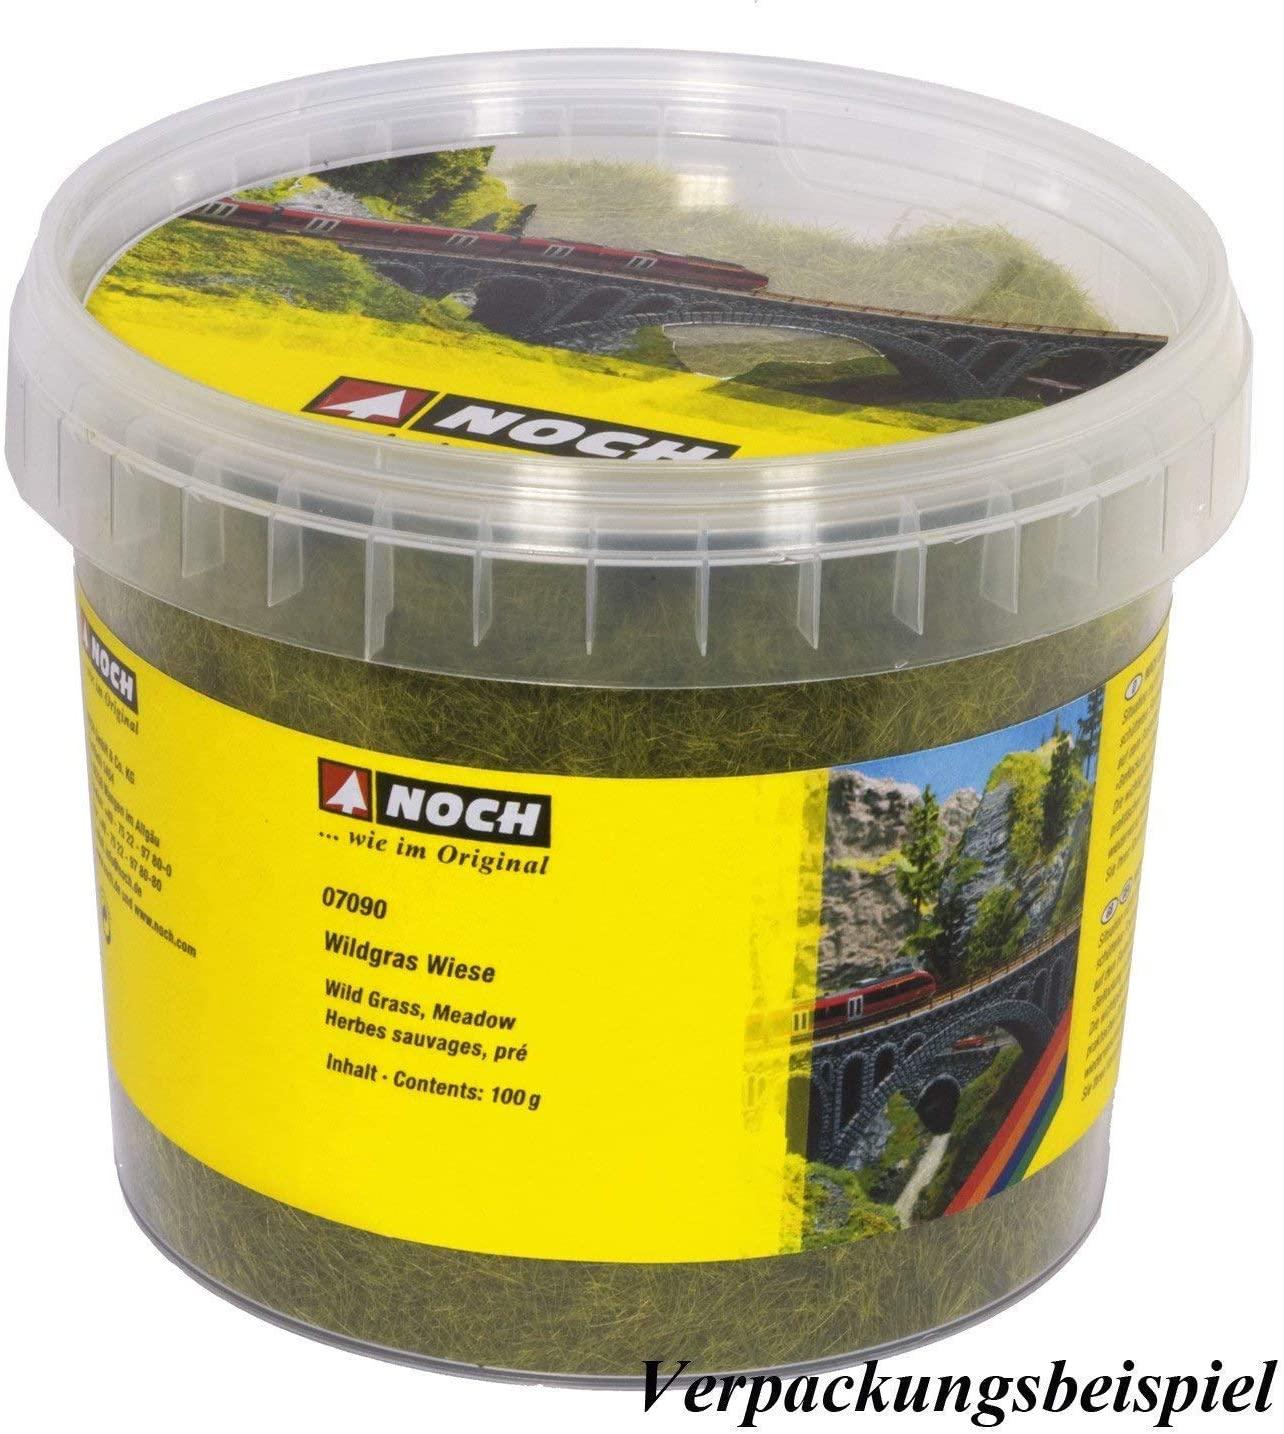 Noch 07093 6 mm Wild Grass Bright Green Landscape Modelling